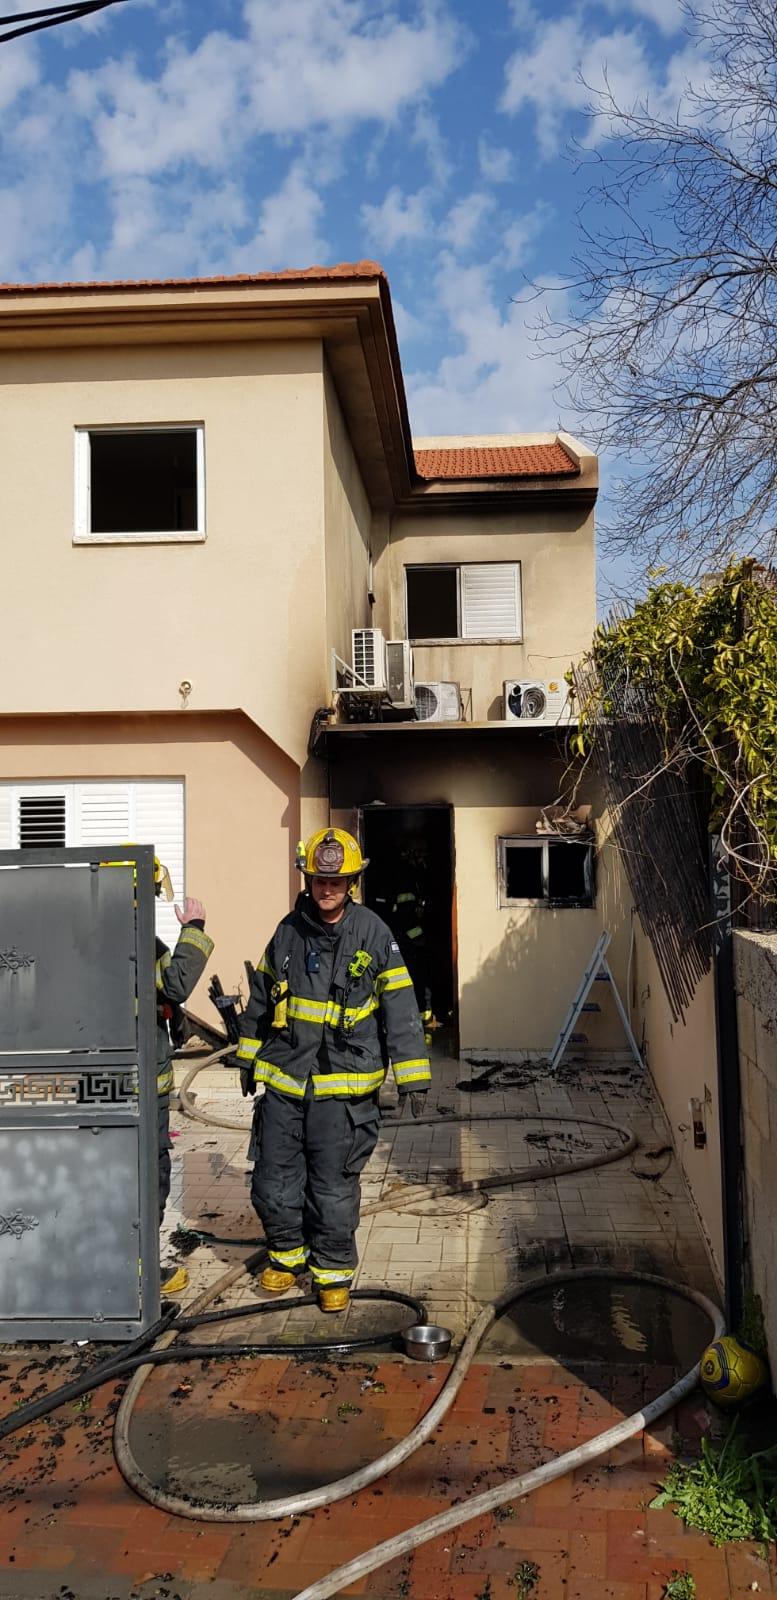 Photo of חמישה צוותי כיבוי פעלו בשריפת מחסן צמוד לבית פרטי בראש העין. לא דווח על נפגעים